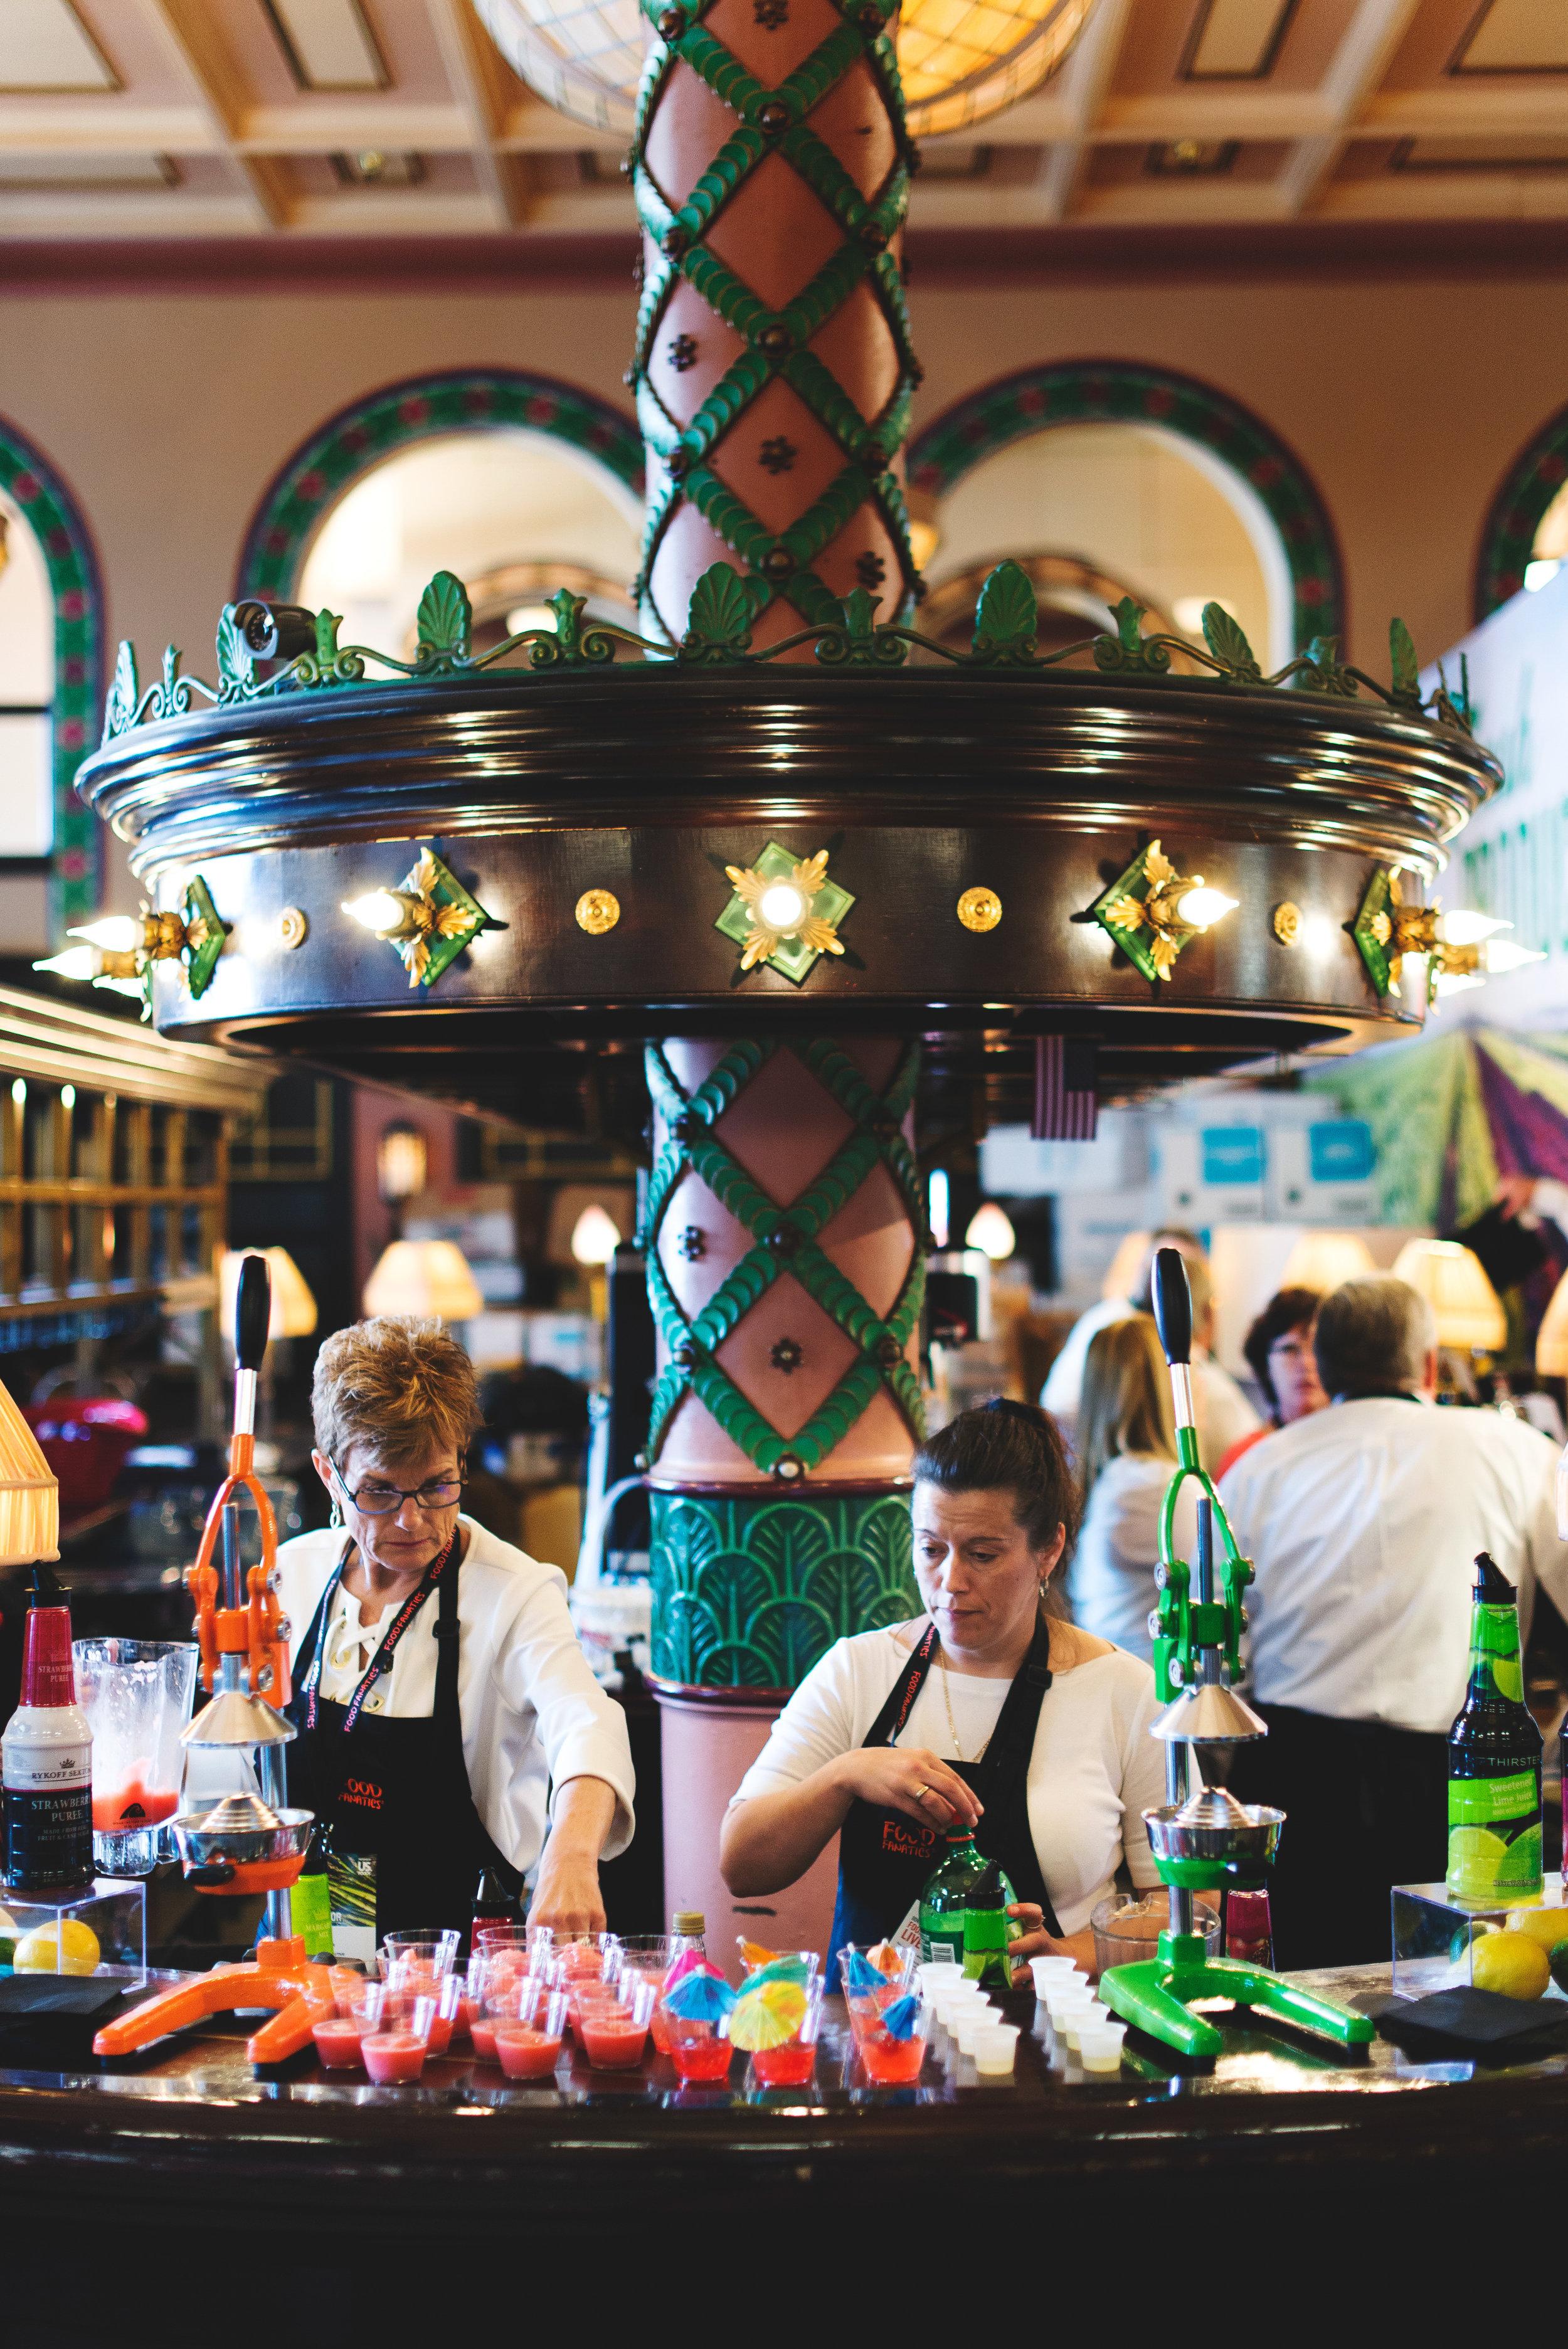 FoodFanaticsLive-Event-Food-Photography056.jpg